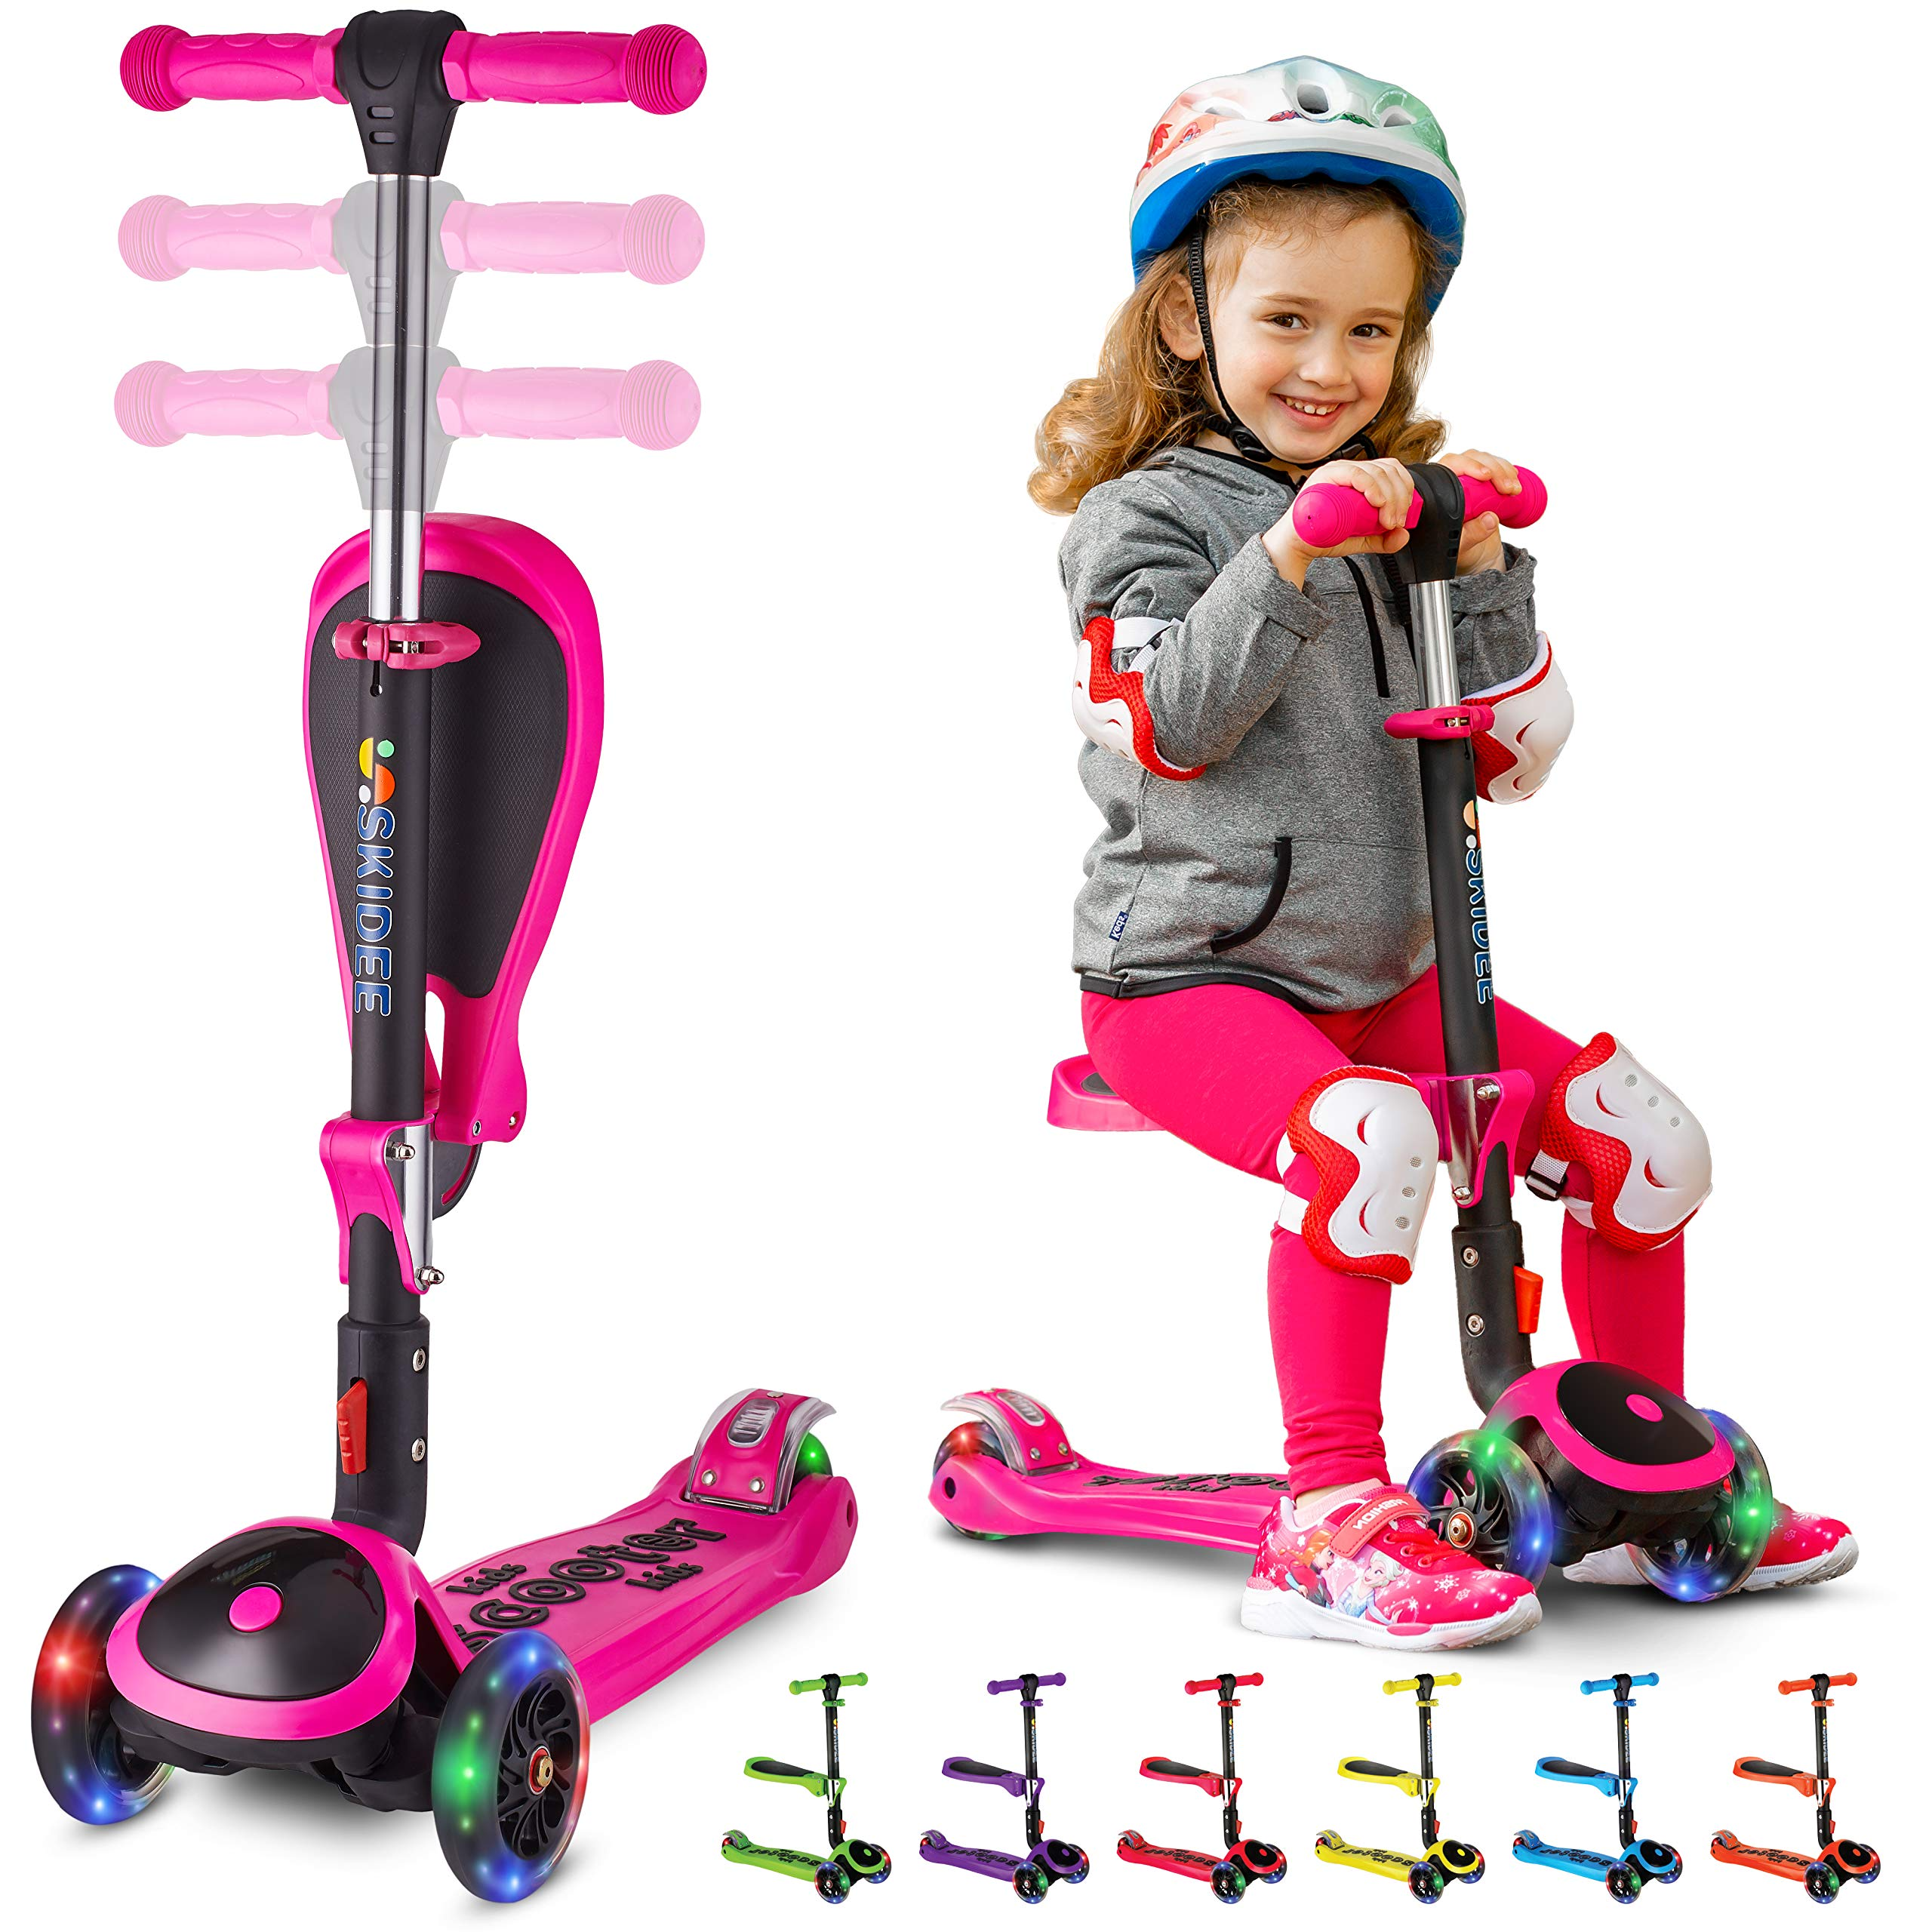 Scooter Kids Folding Seat Adjustable